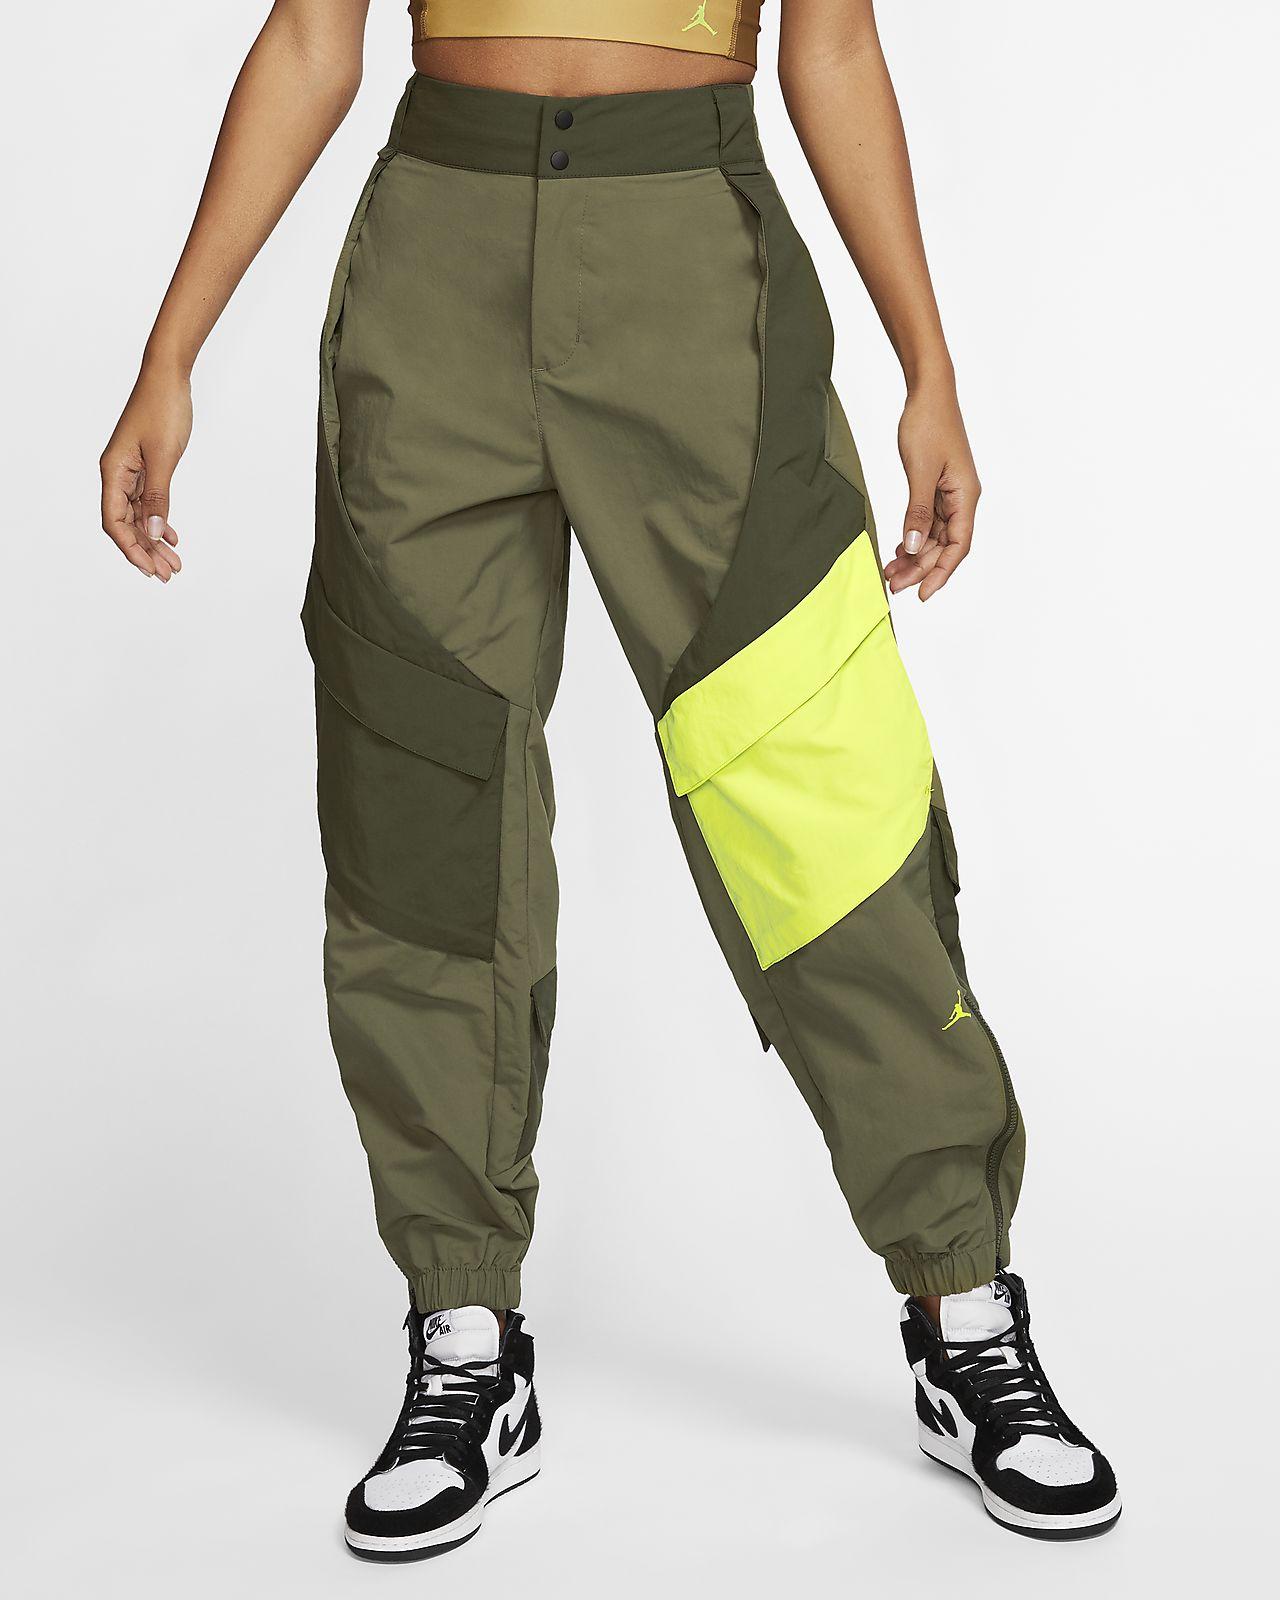 Jordan Pantalons funcionals - Dona